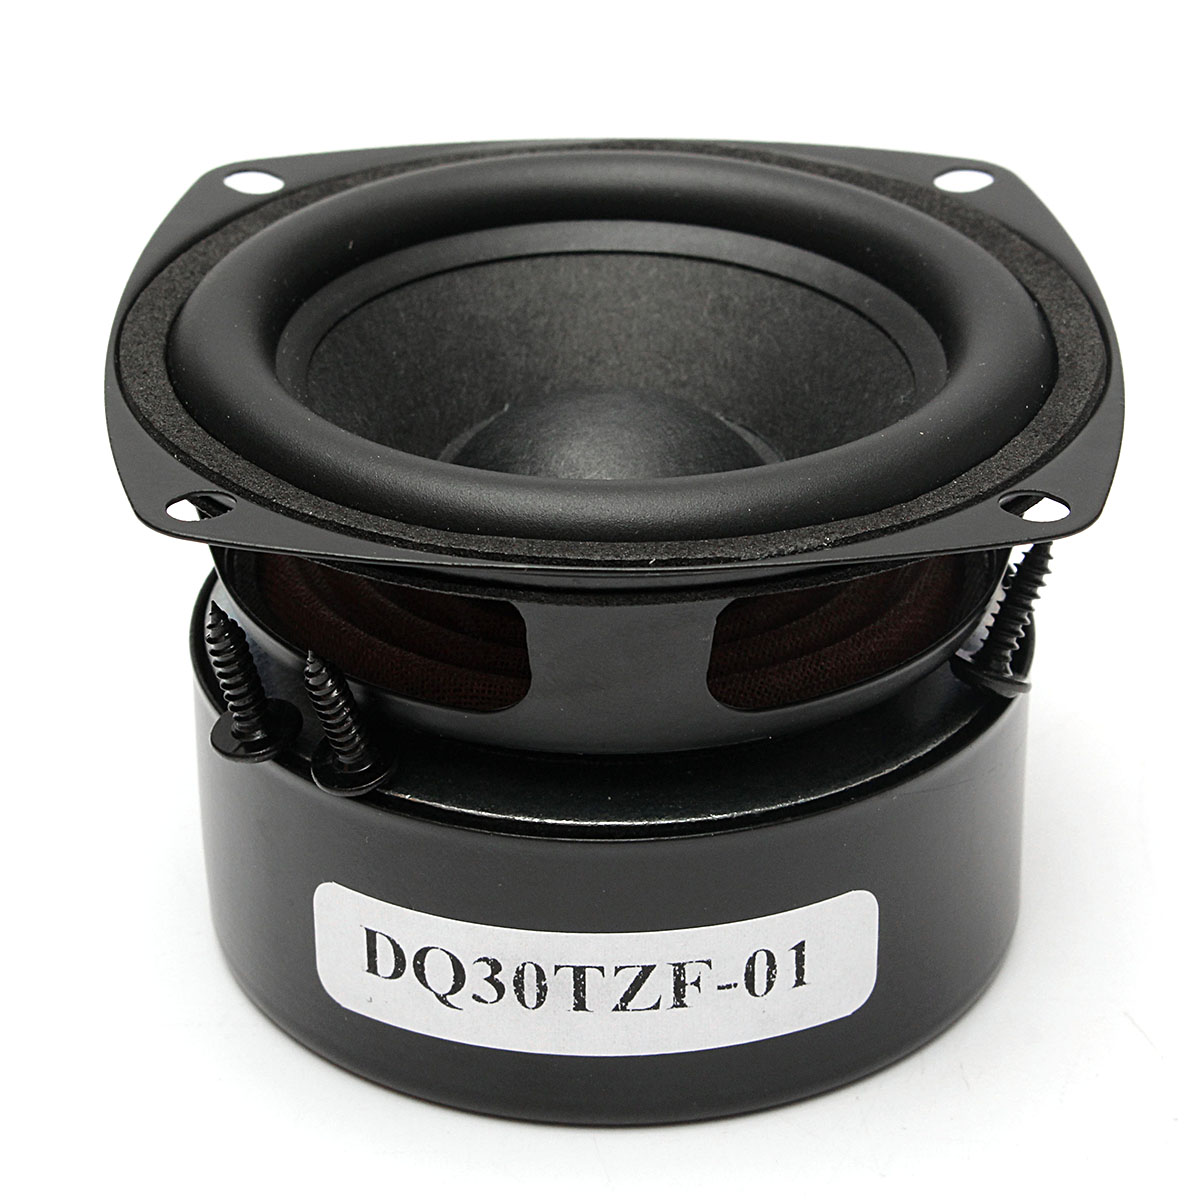 small resolution of please confirm the size and the power before install the speakers to you car htb10jhnlvxxxxxnxxxxq6xxfxxxk htb1aknelvxxxxaaxpxxq6xxfxxx7